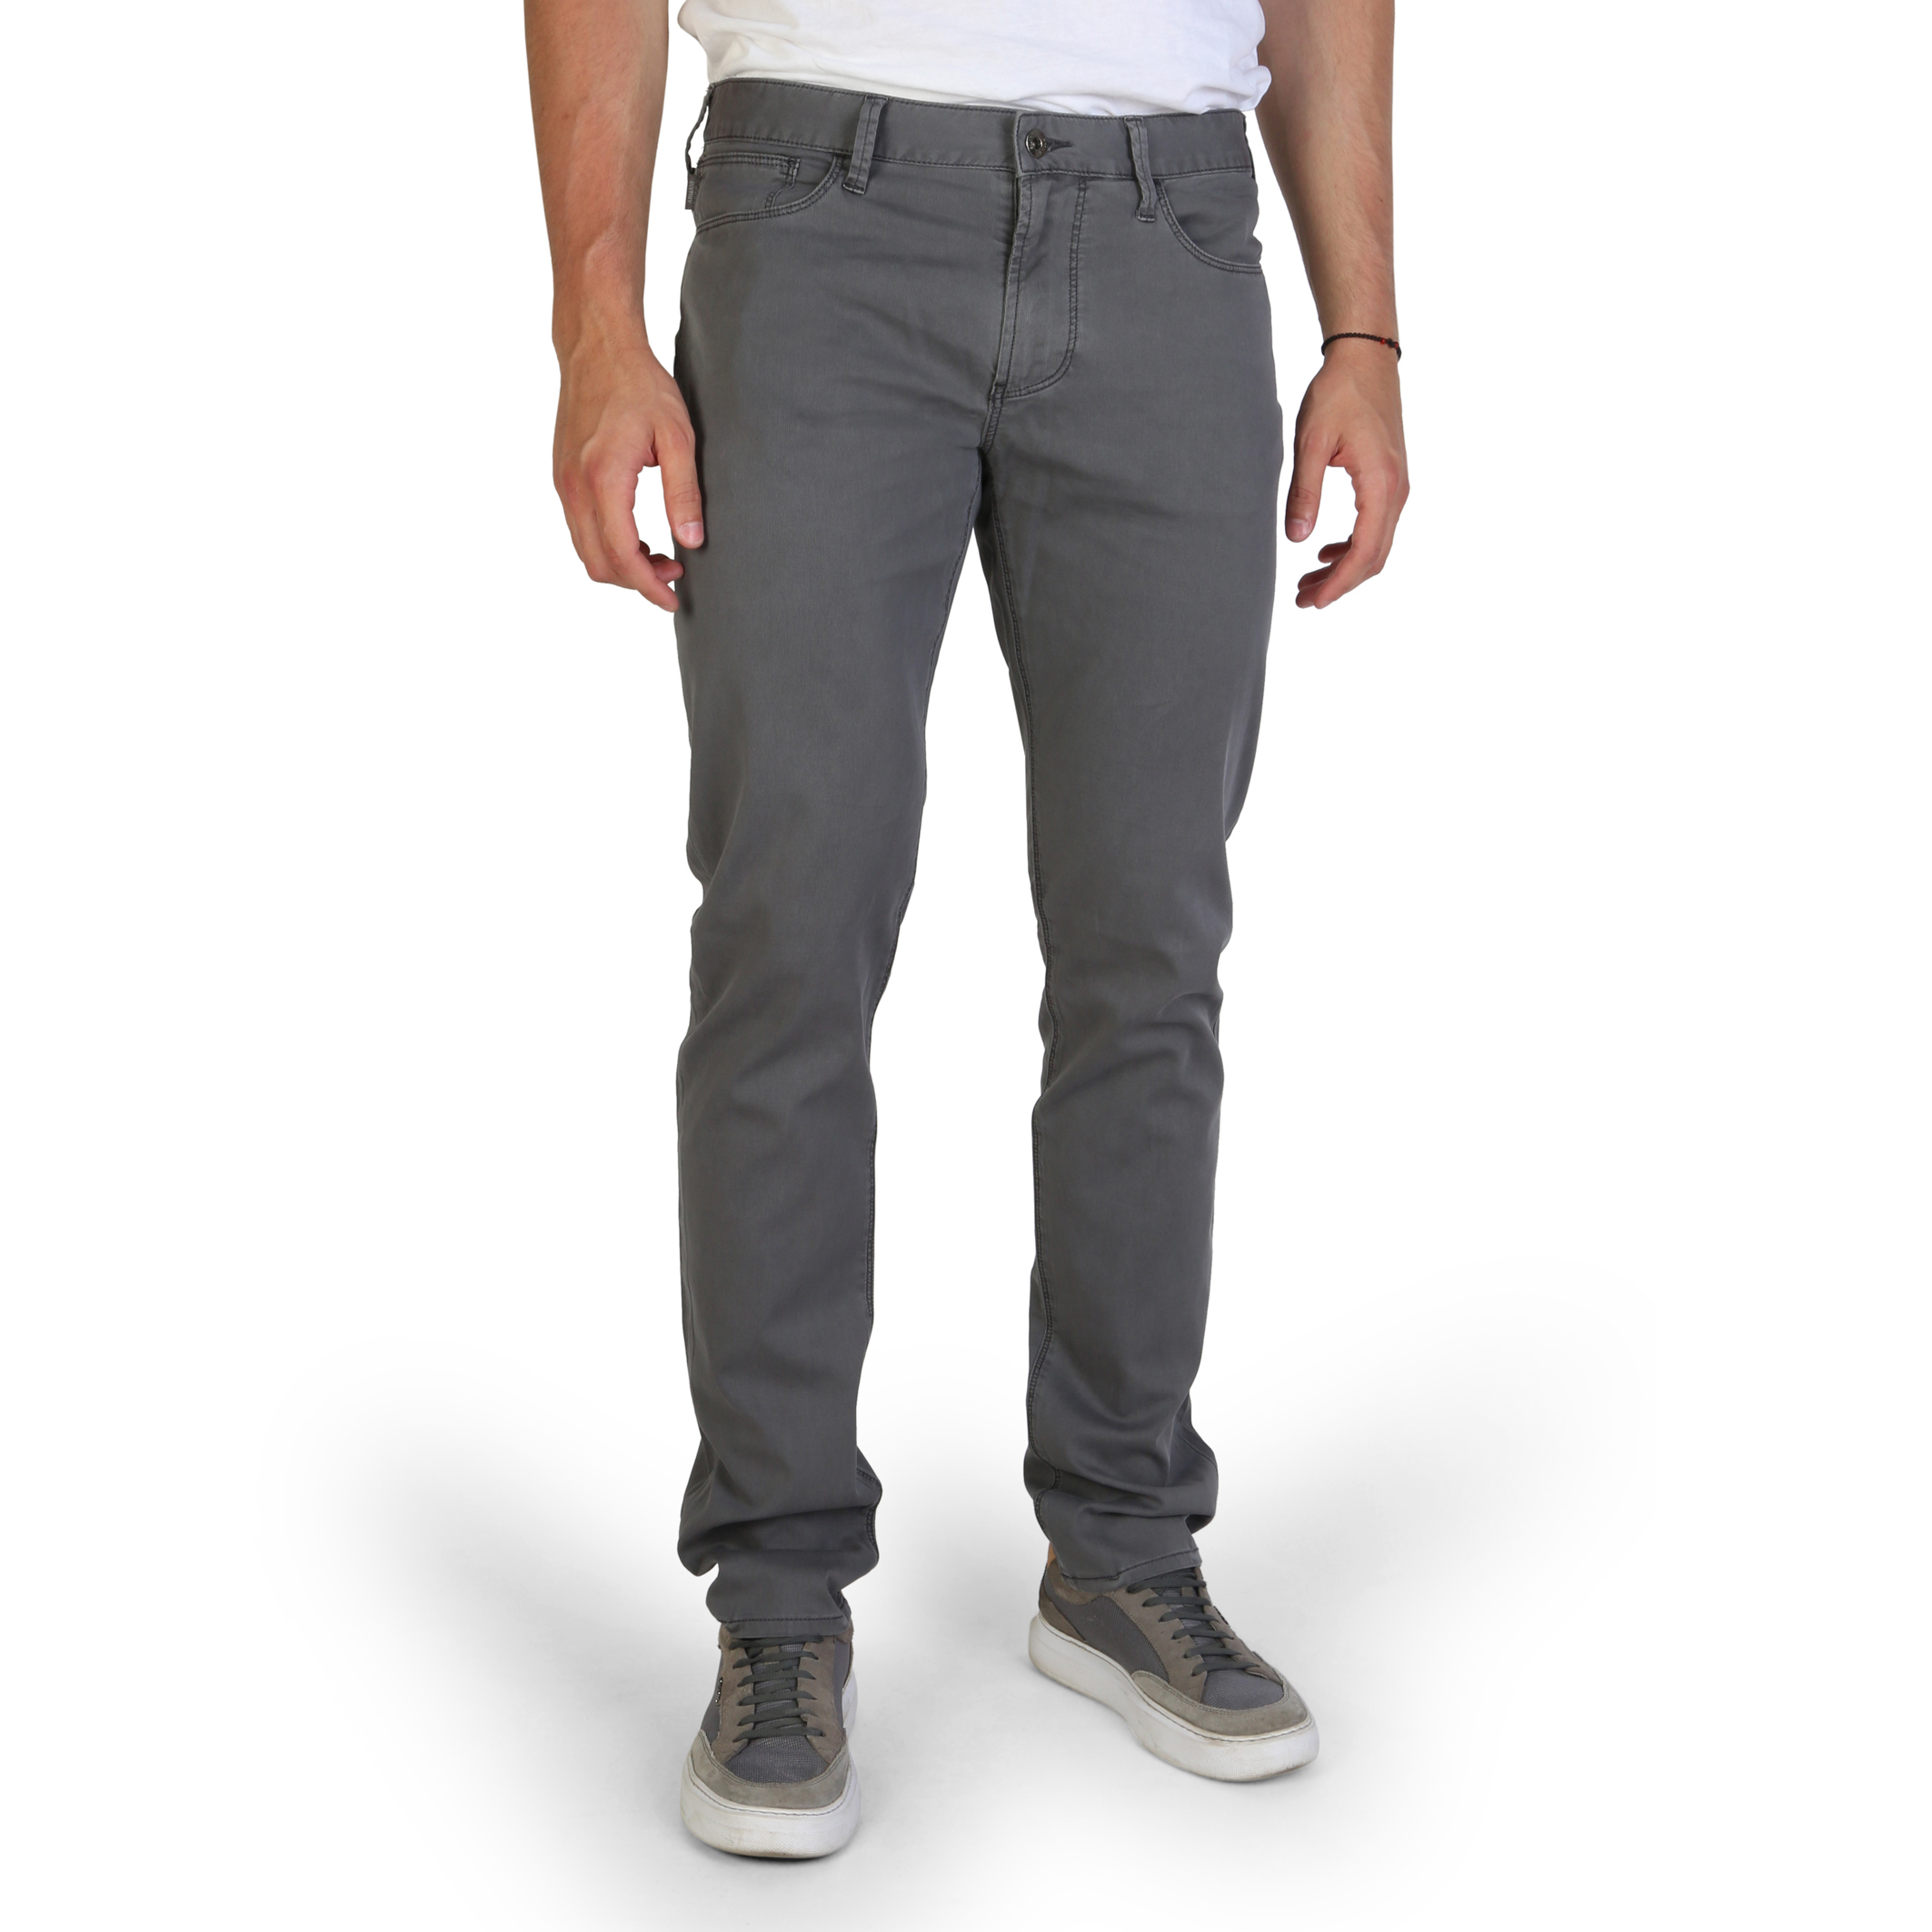 Armani Jeans 3Y6J06_6NEEZ Uomo Grigio 107938Armani Jeans